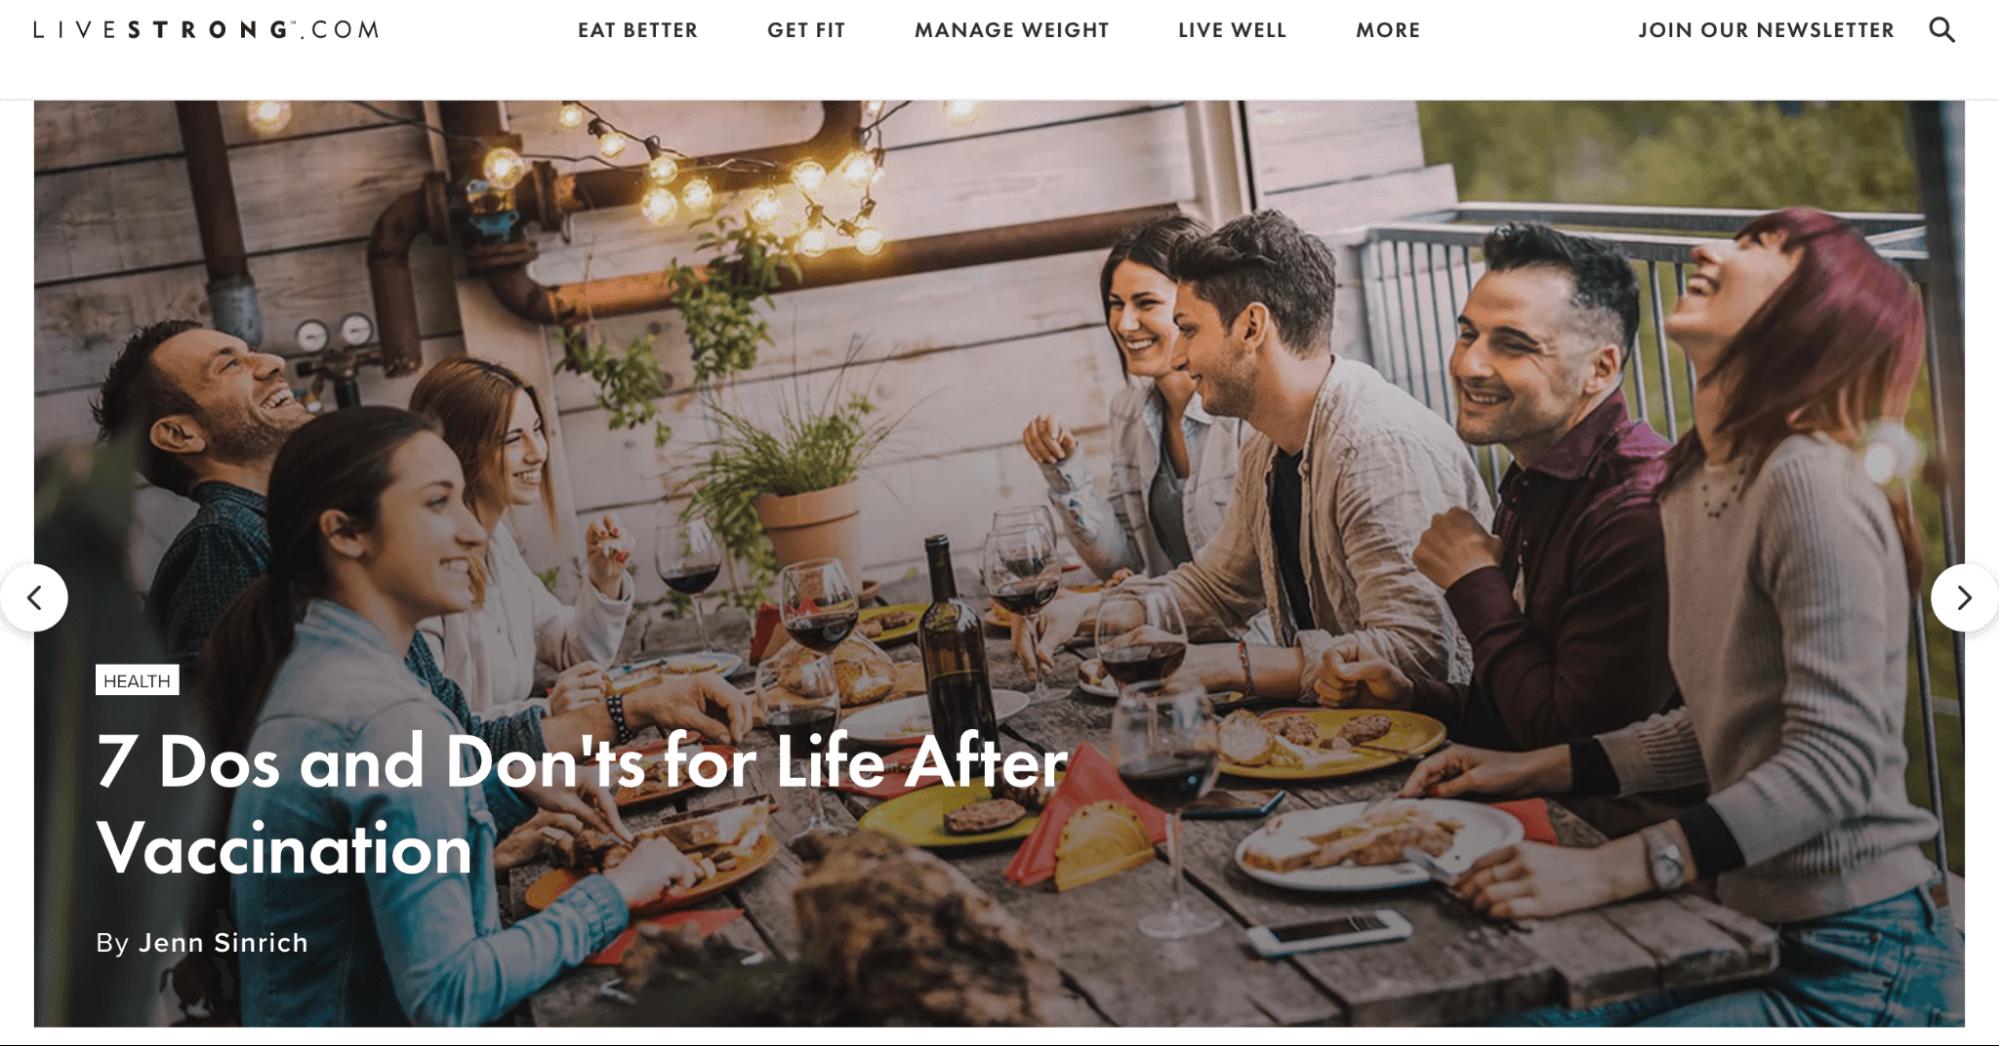 Nutrition website Livestrong